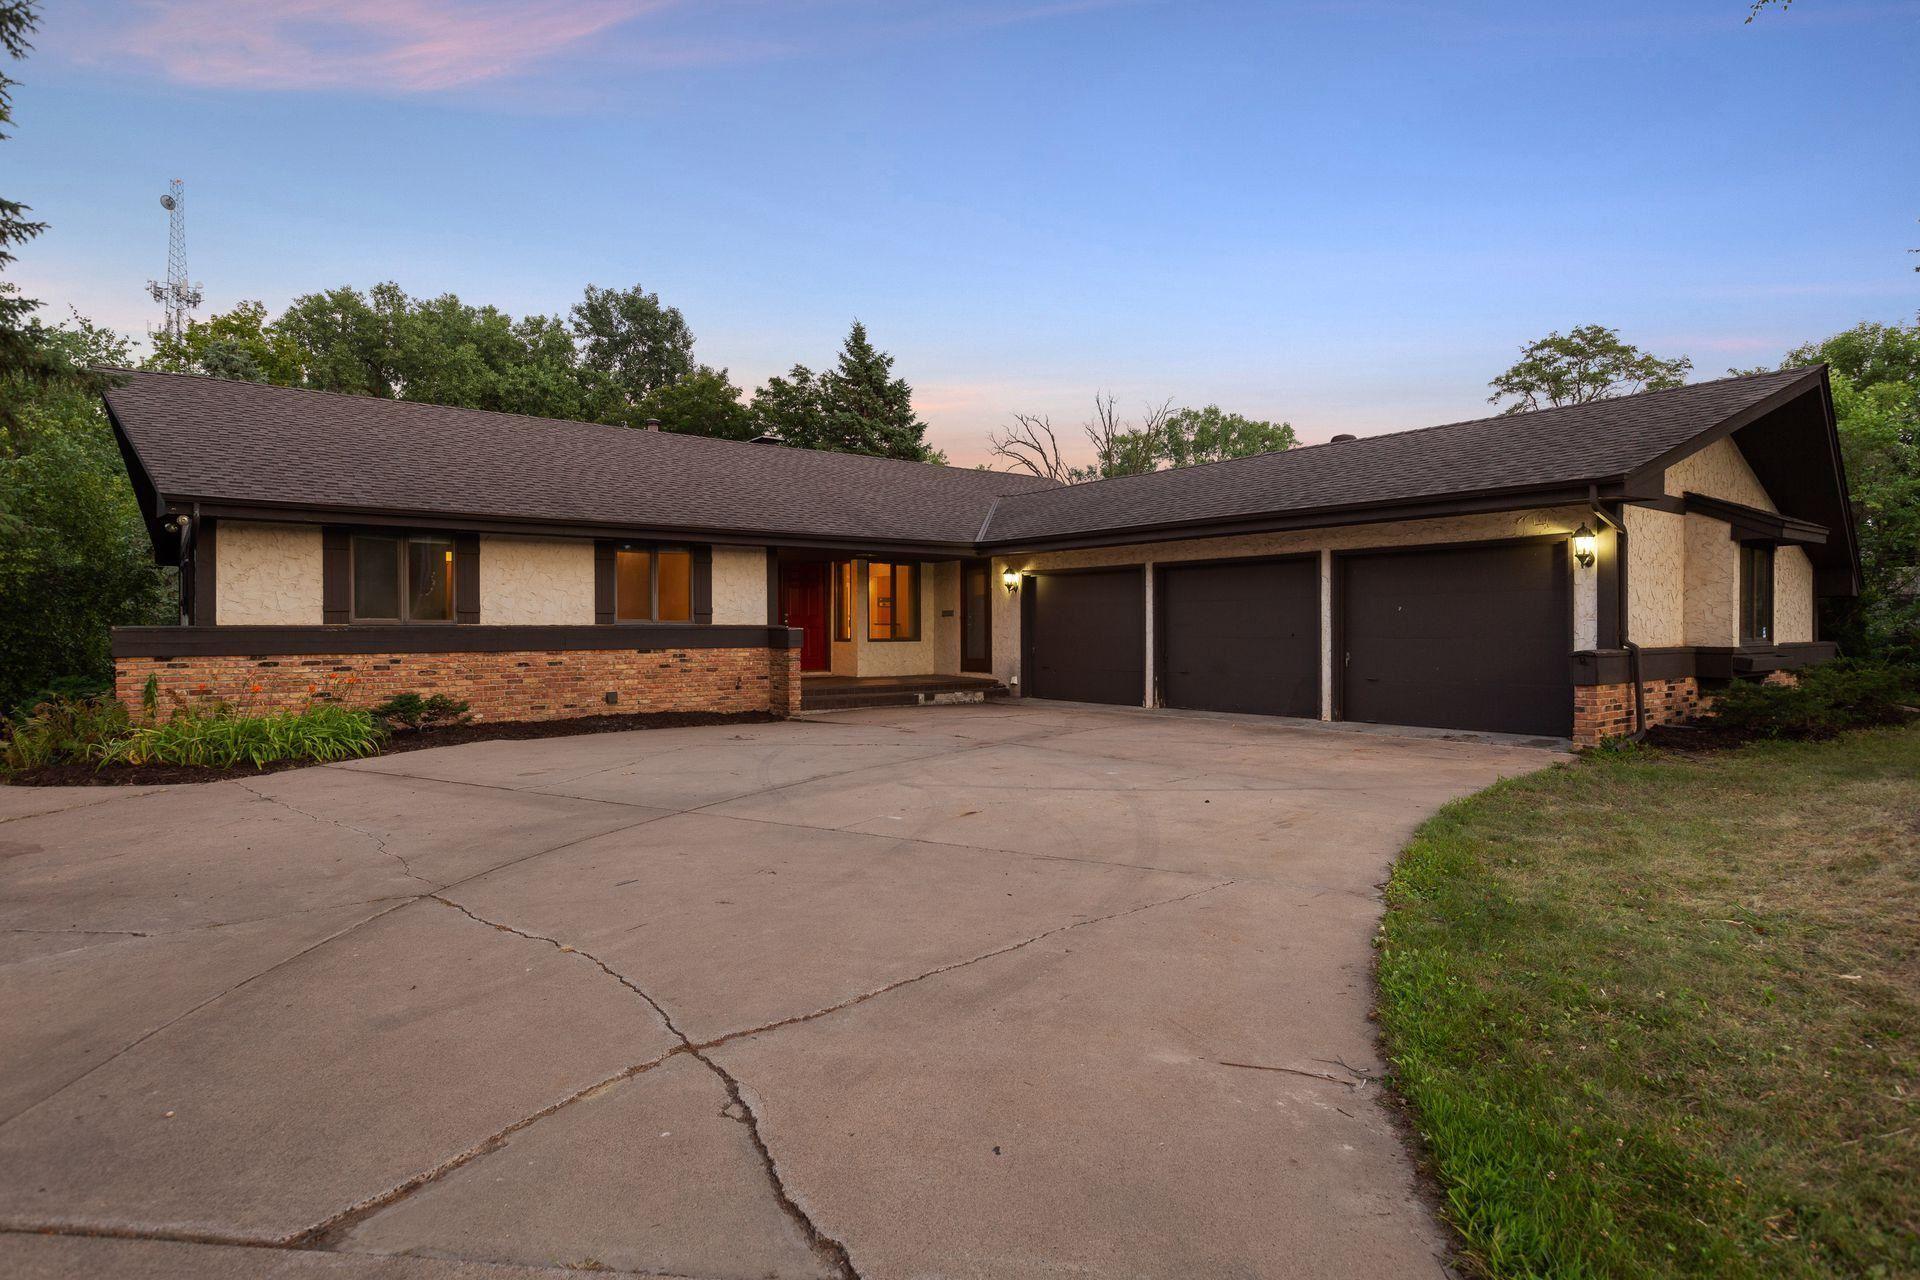 1970 Adair Avenue N, Golden Valley, MN 55422 - MLS#: 5636311